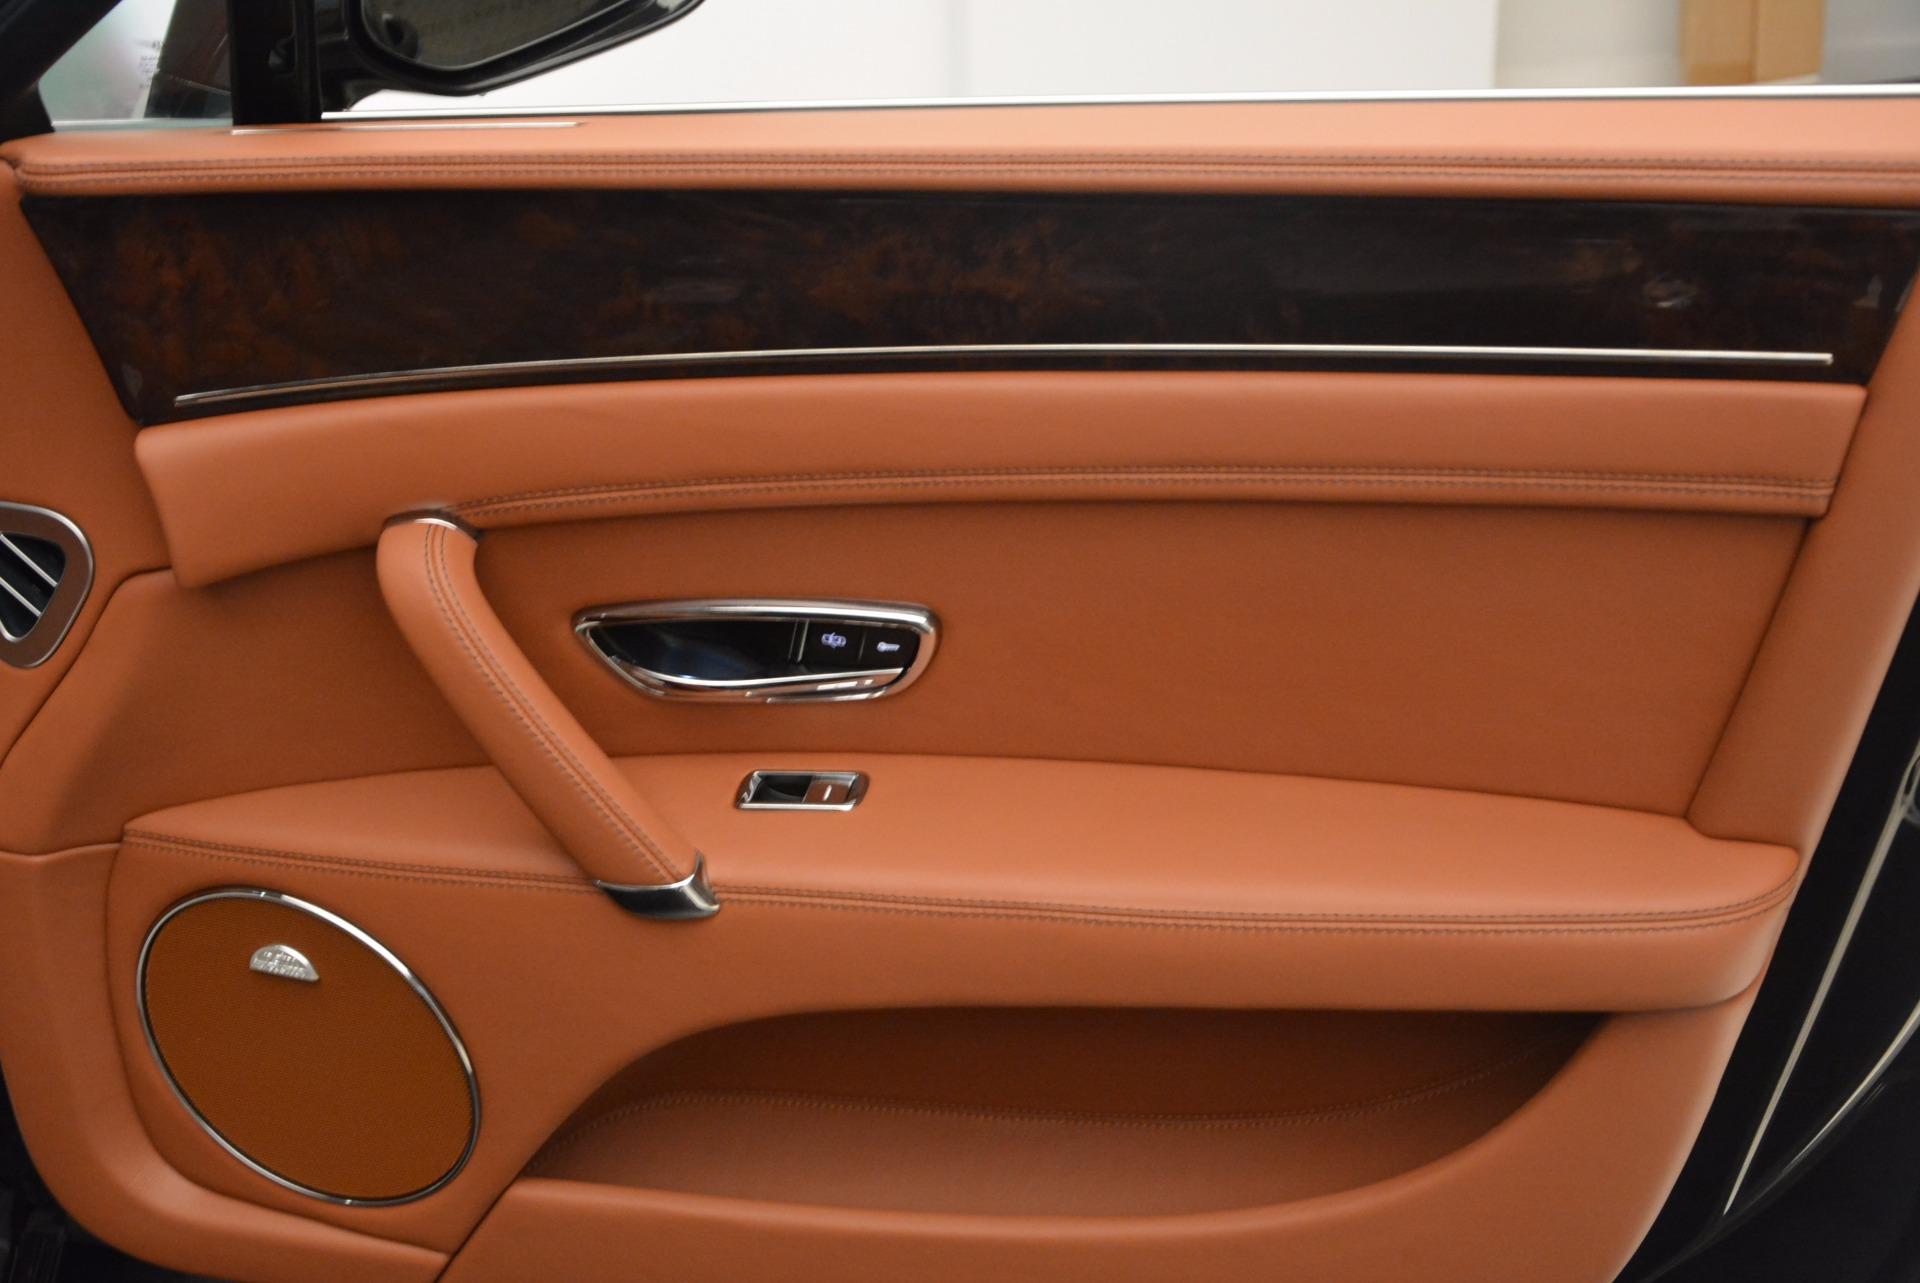 Used 2014 Bentley Flying Spur W12 For Sale In Westport, CT 1598_p38